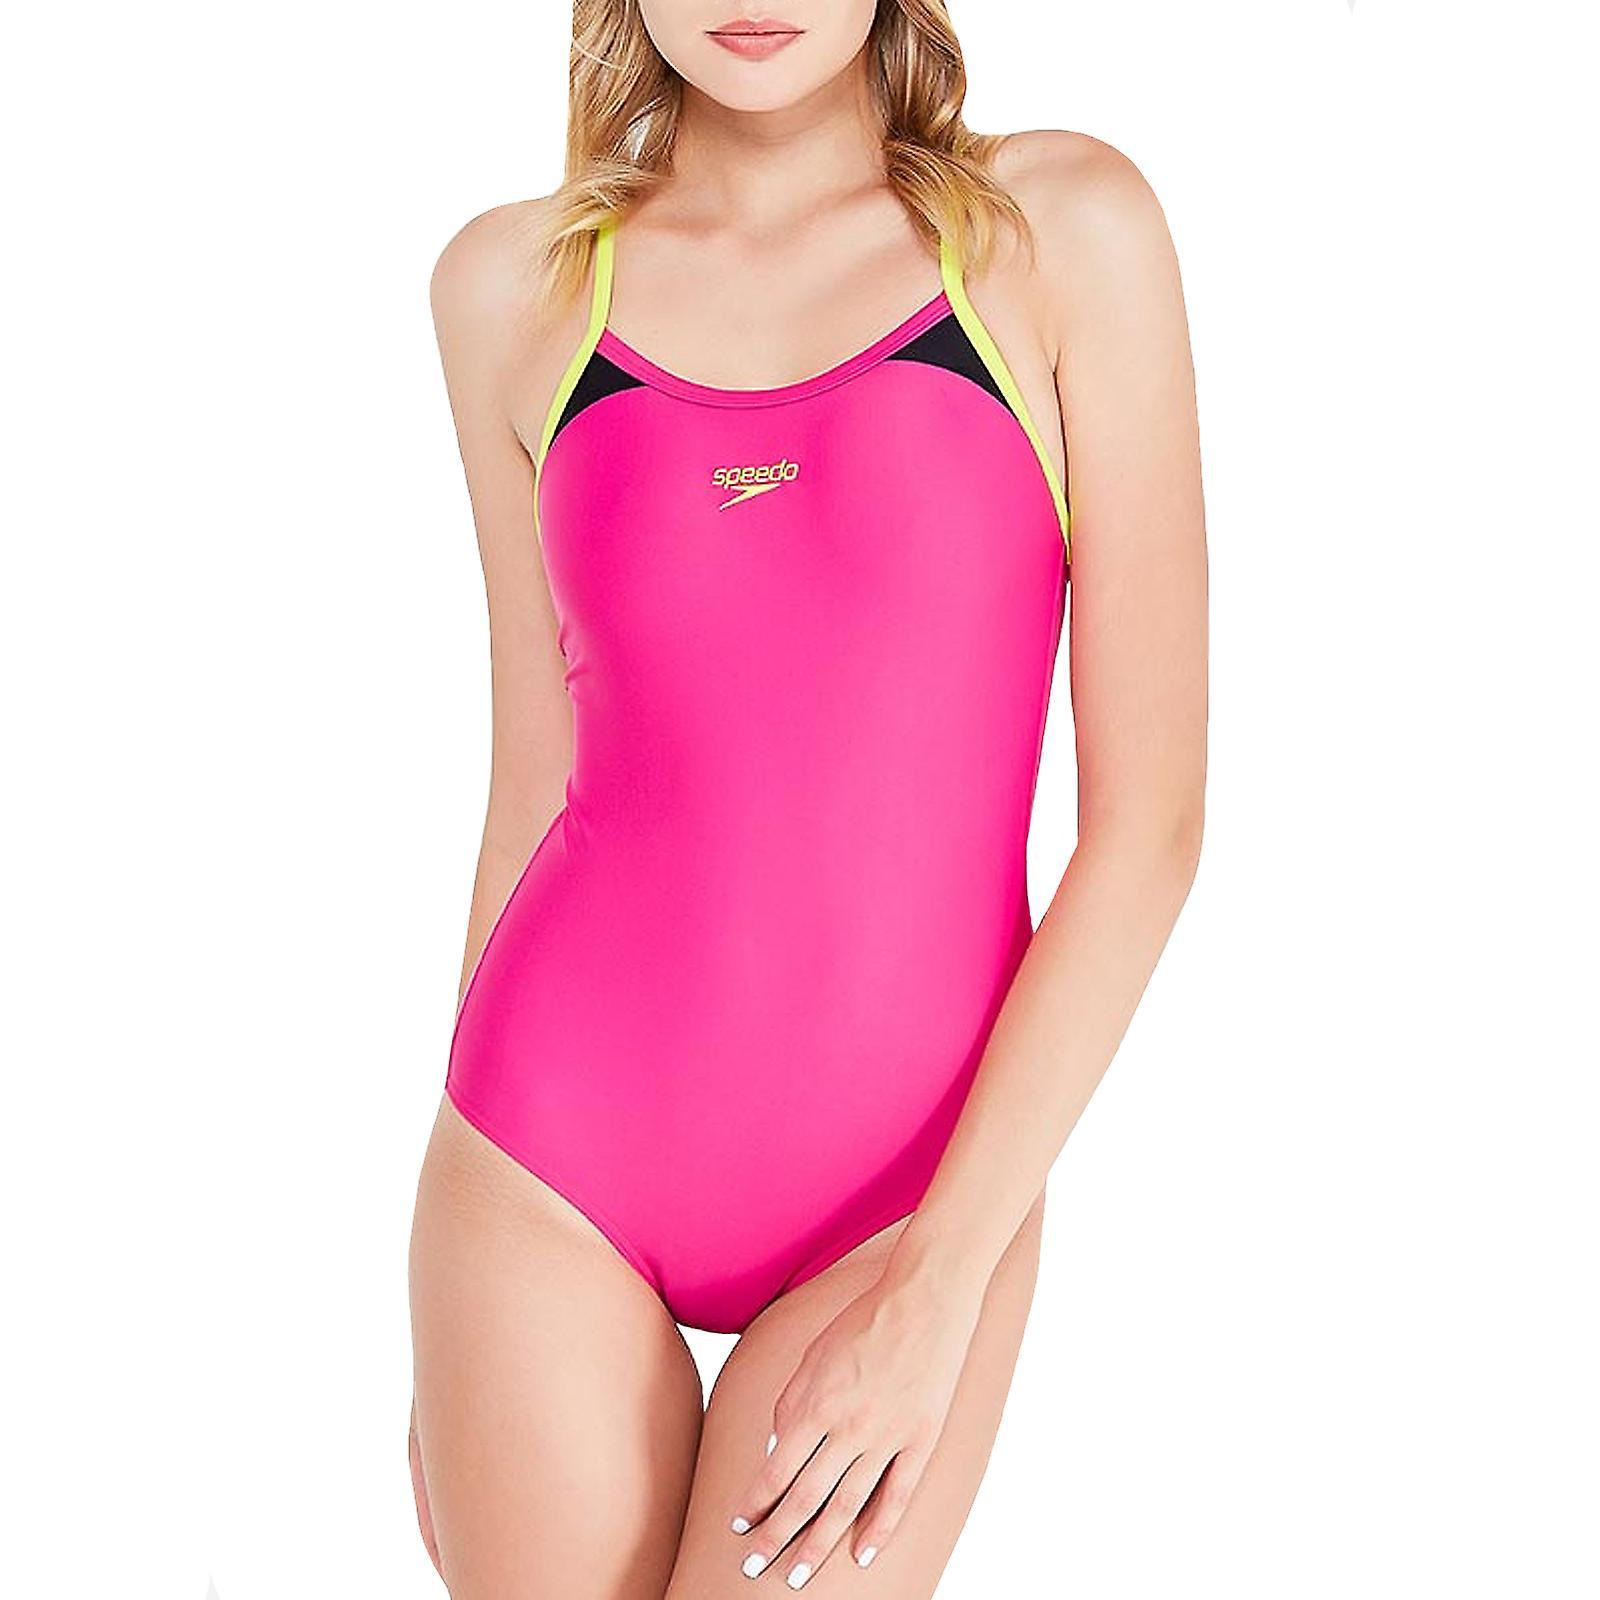 Speedo Womens Splice Thinstrap Racerback Swimsuit Swim Sports